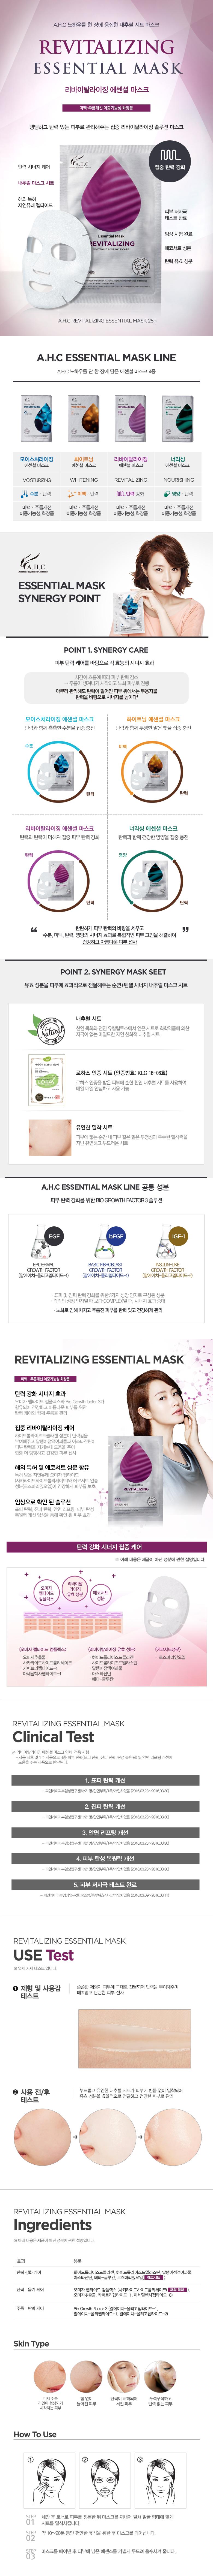 AHC Revitalizing Essential Mask 25g x 25ea malaysia singapore indonesia